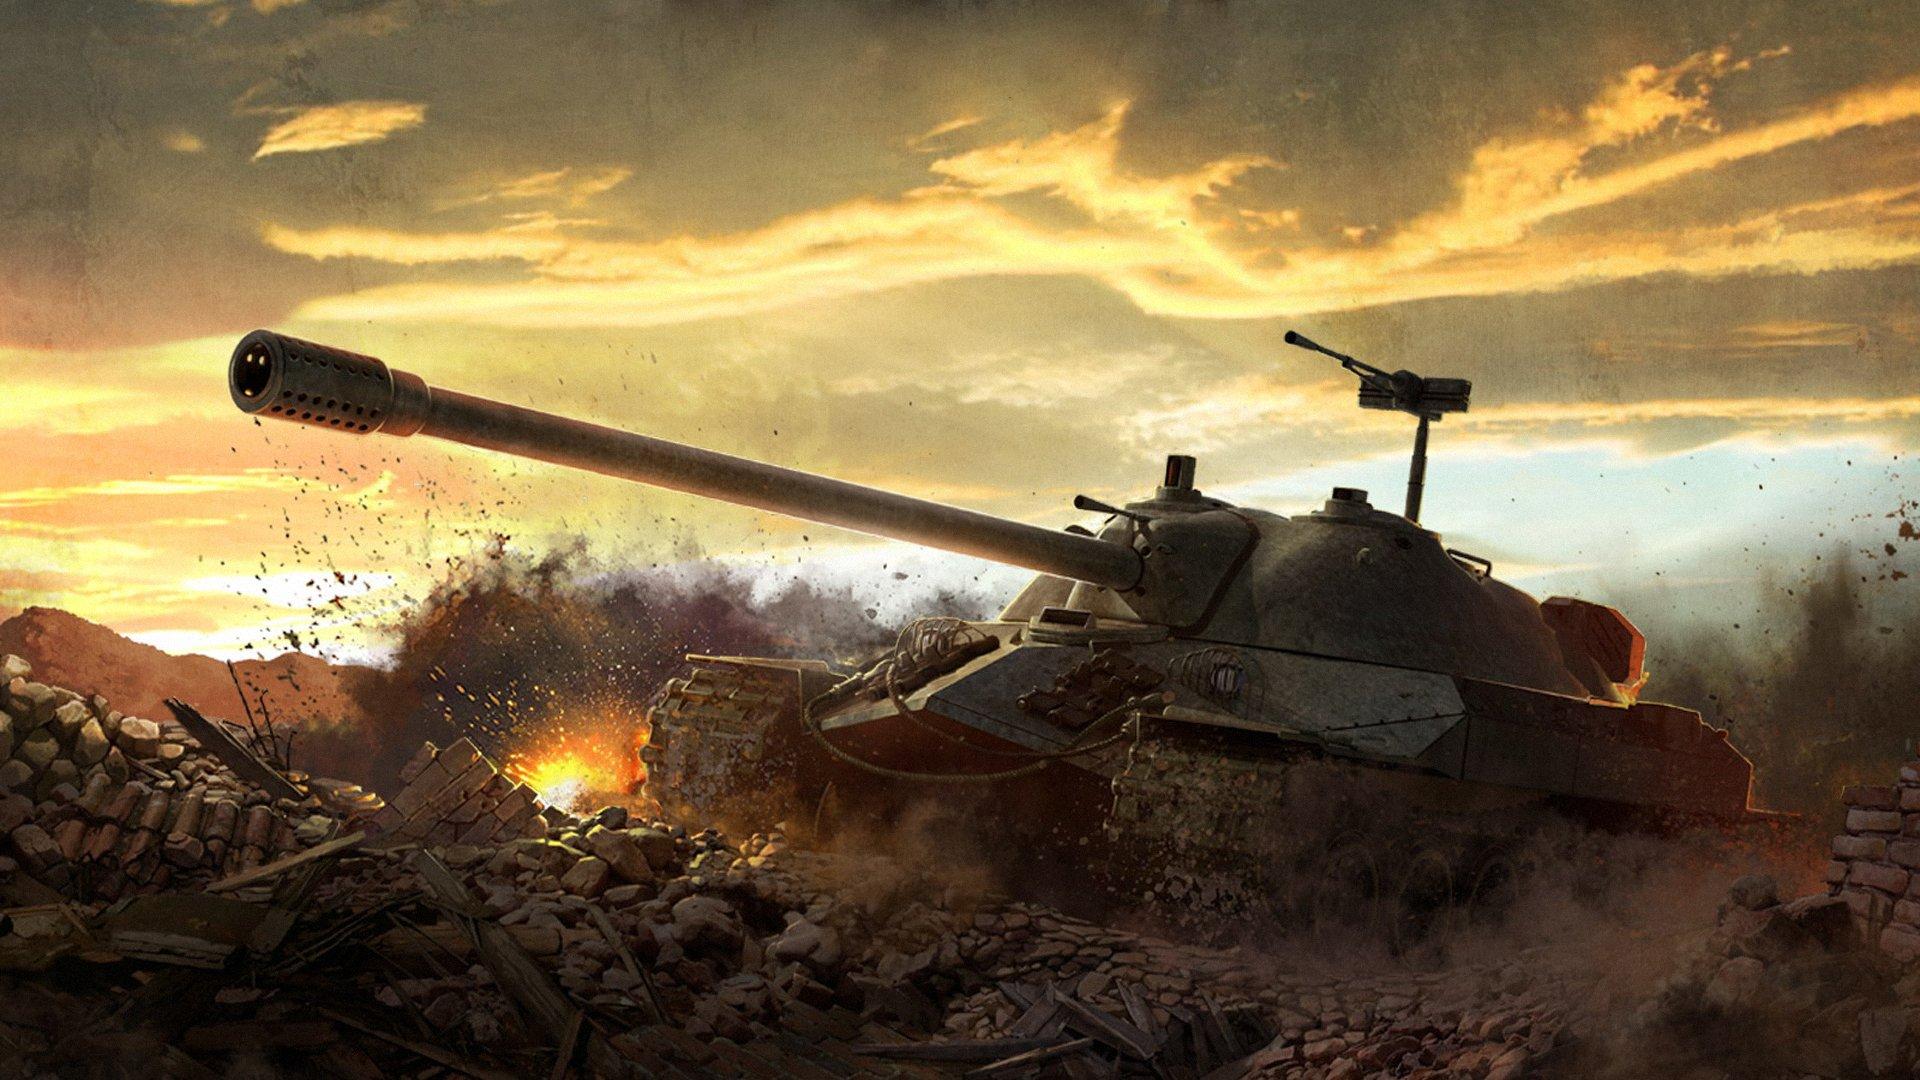 49] Tank Wallpaper on WallpaperSafari 1920x1080